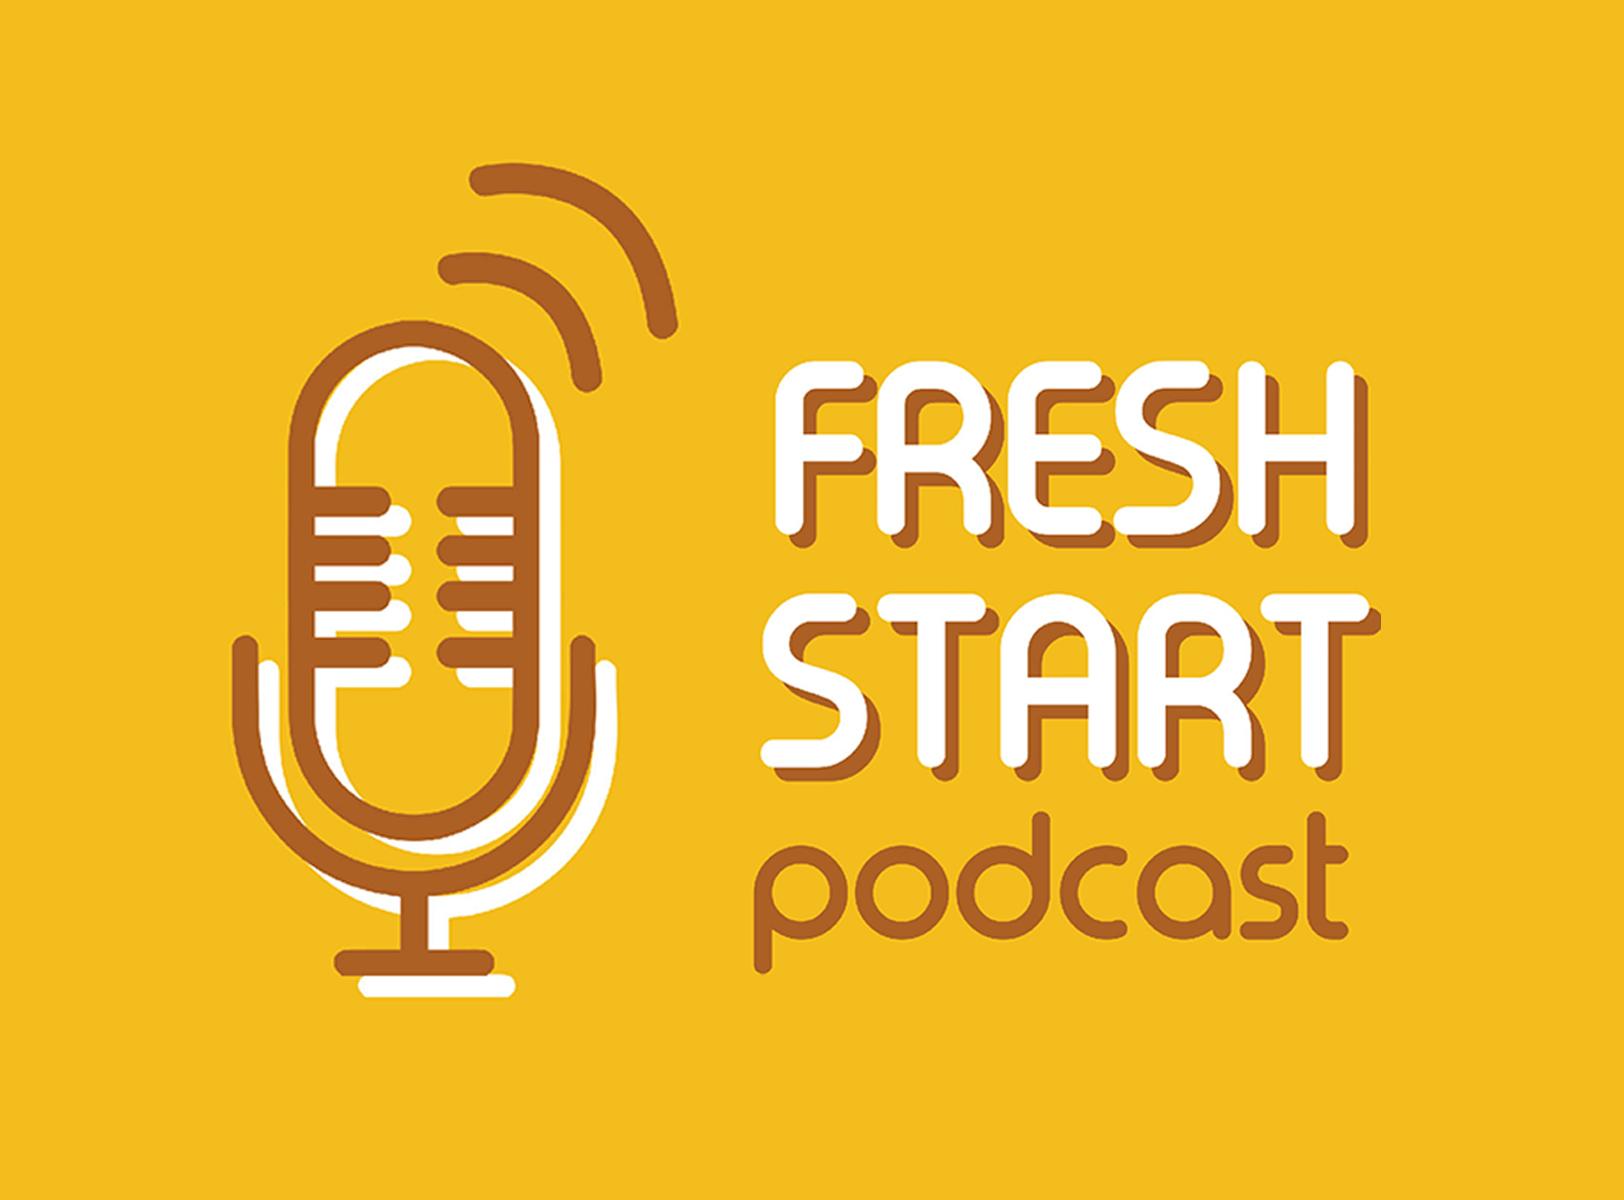 Fresh Start: Podcast News (6/20/2019 Thu.)